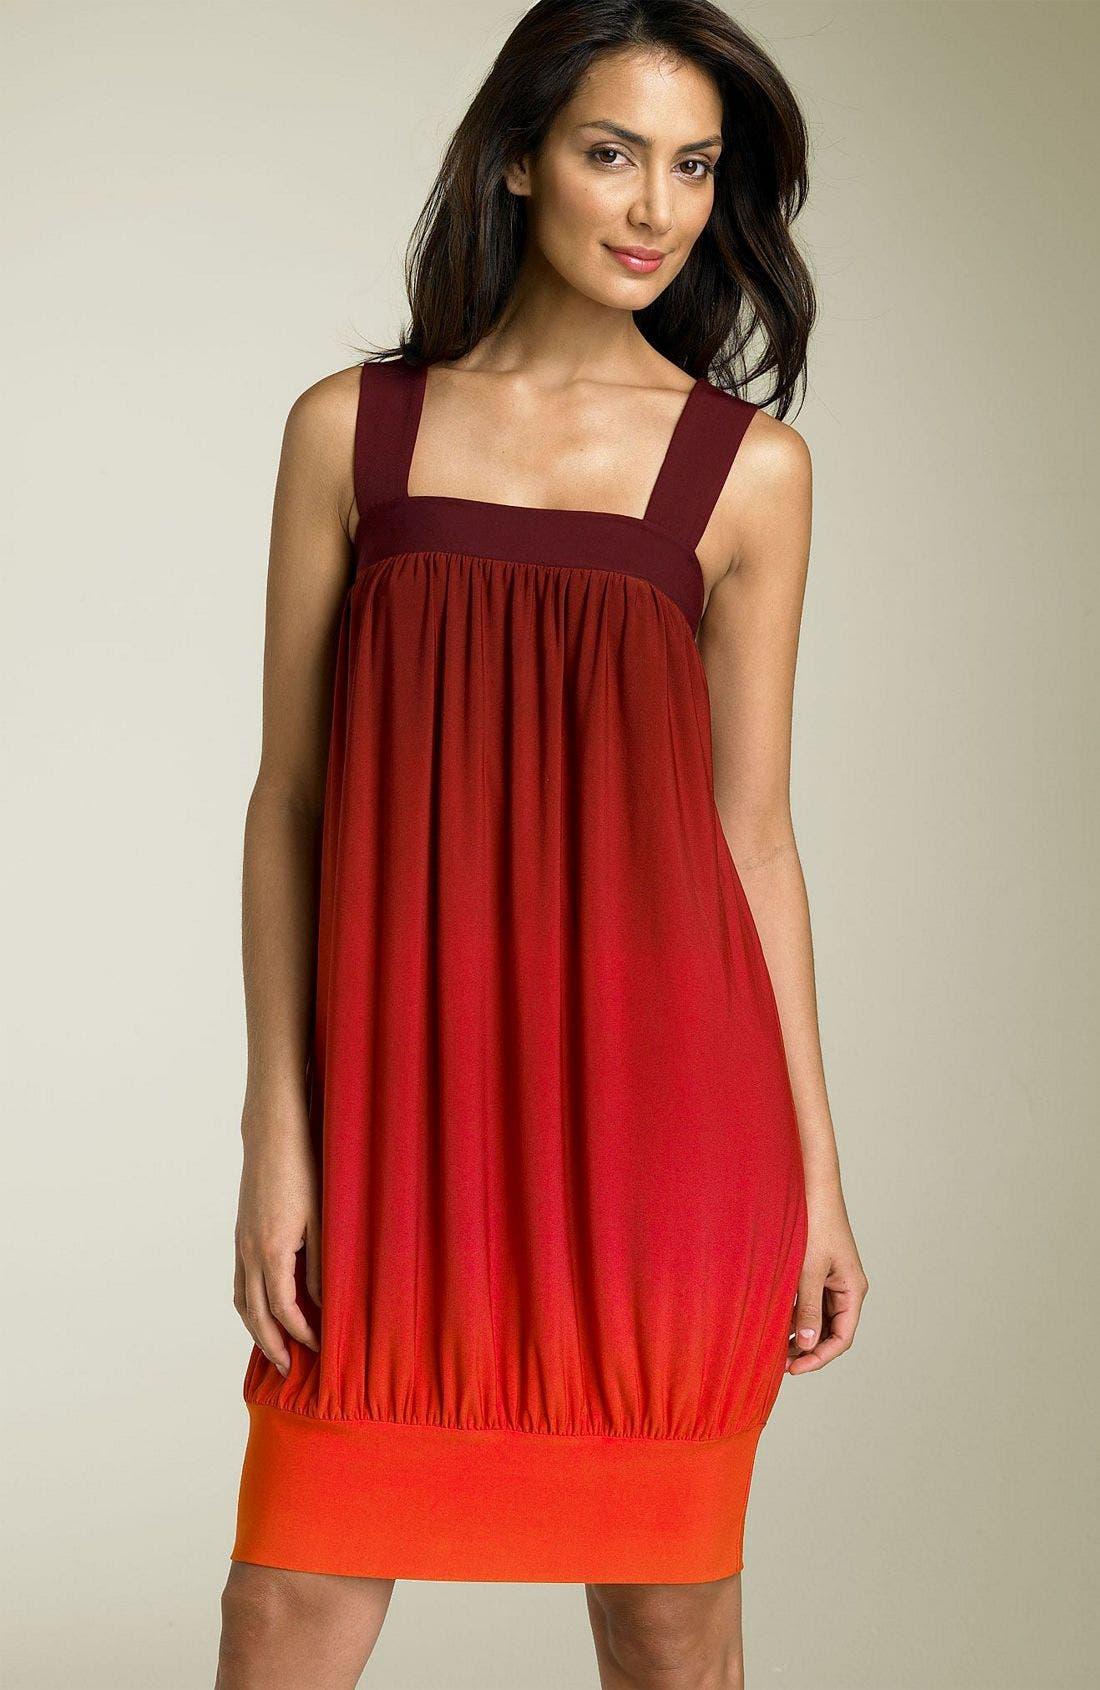 Alternate Image 1 Selected - Donna Morgan Sleeveless Ombré Dress